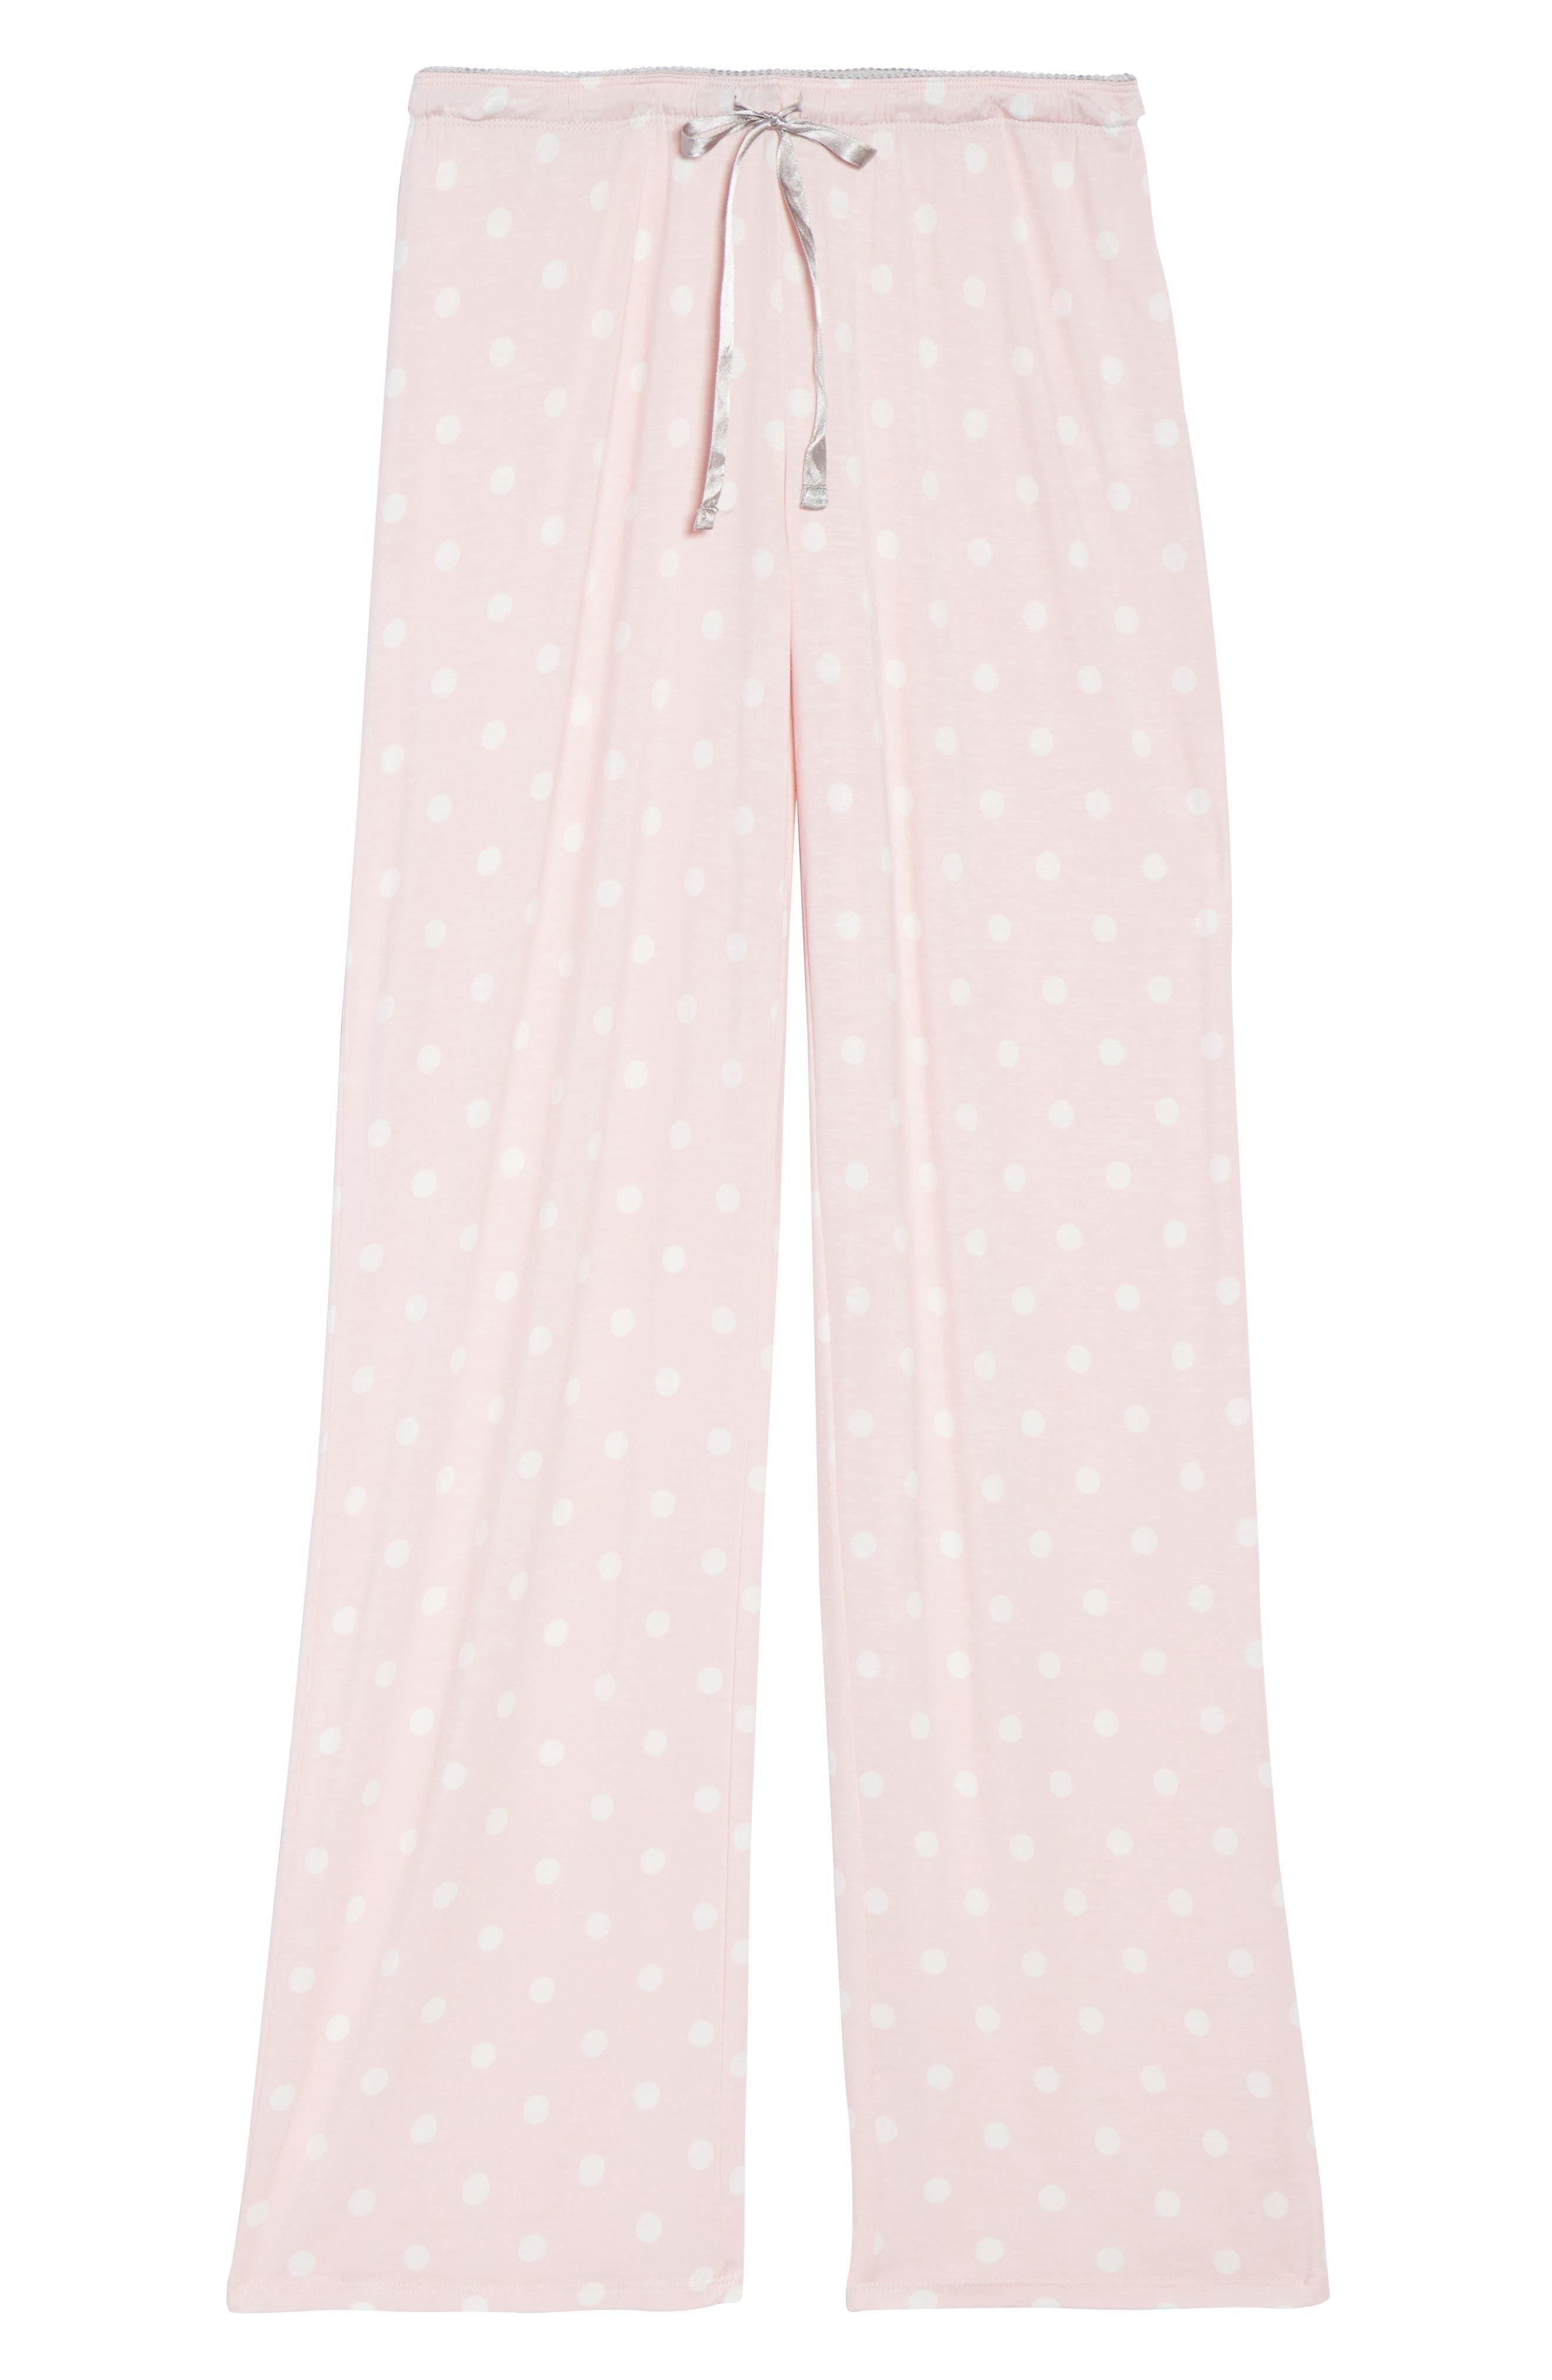 Drawstring Pajama Pants,                             Alternate thumbnail 7, color,                             Pink